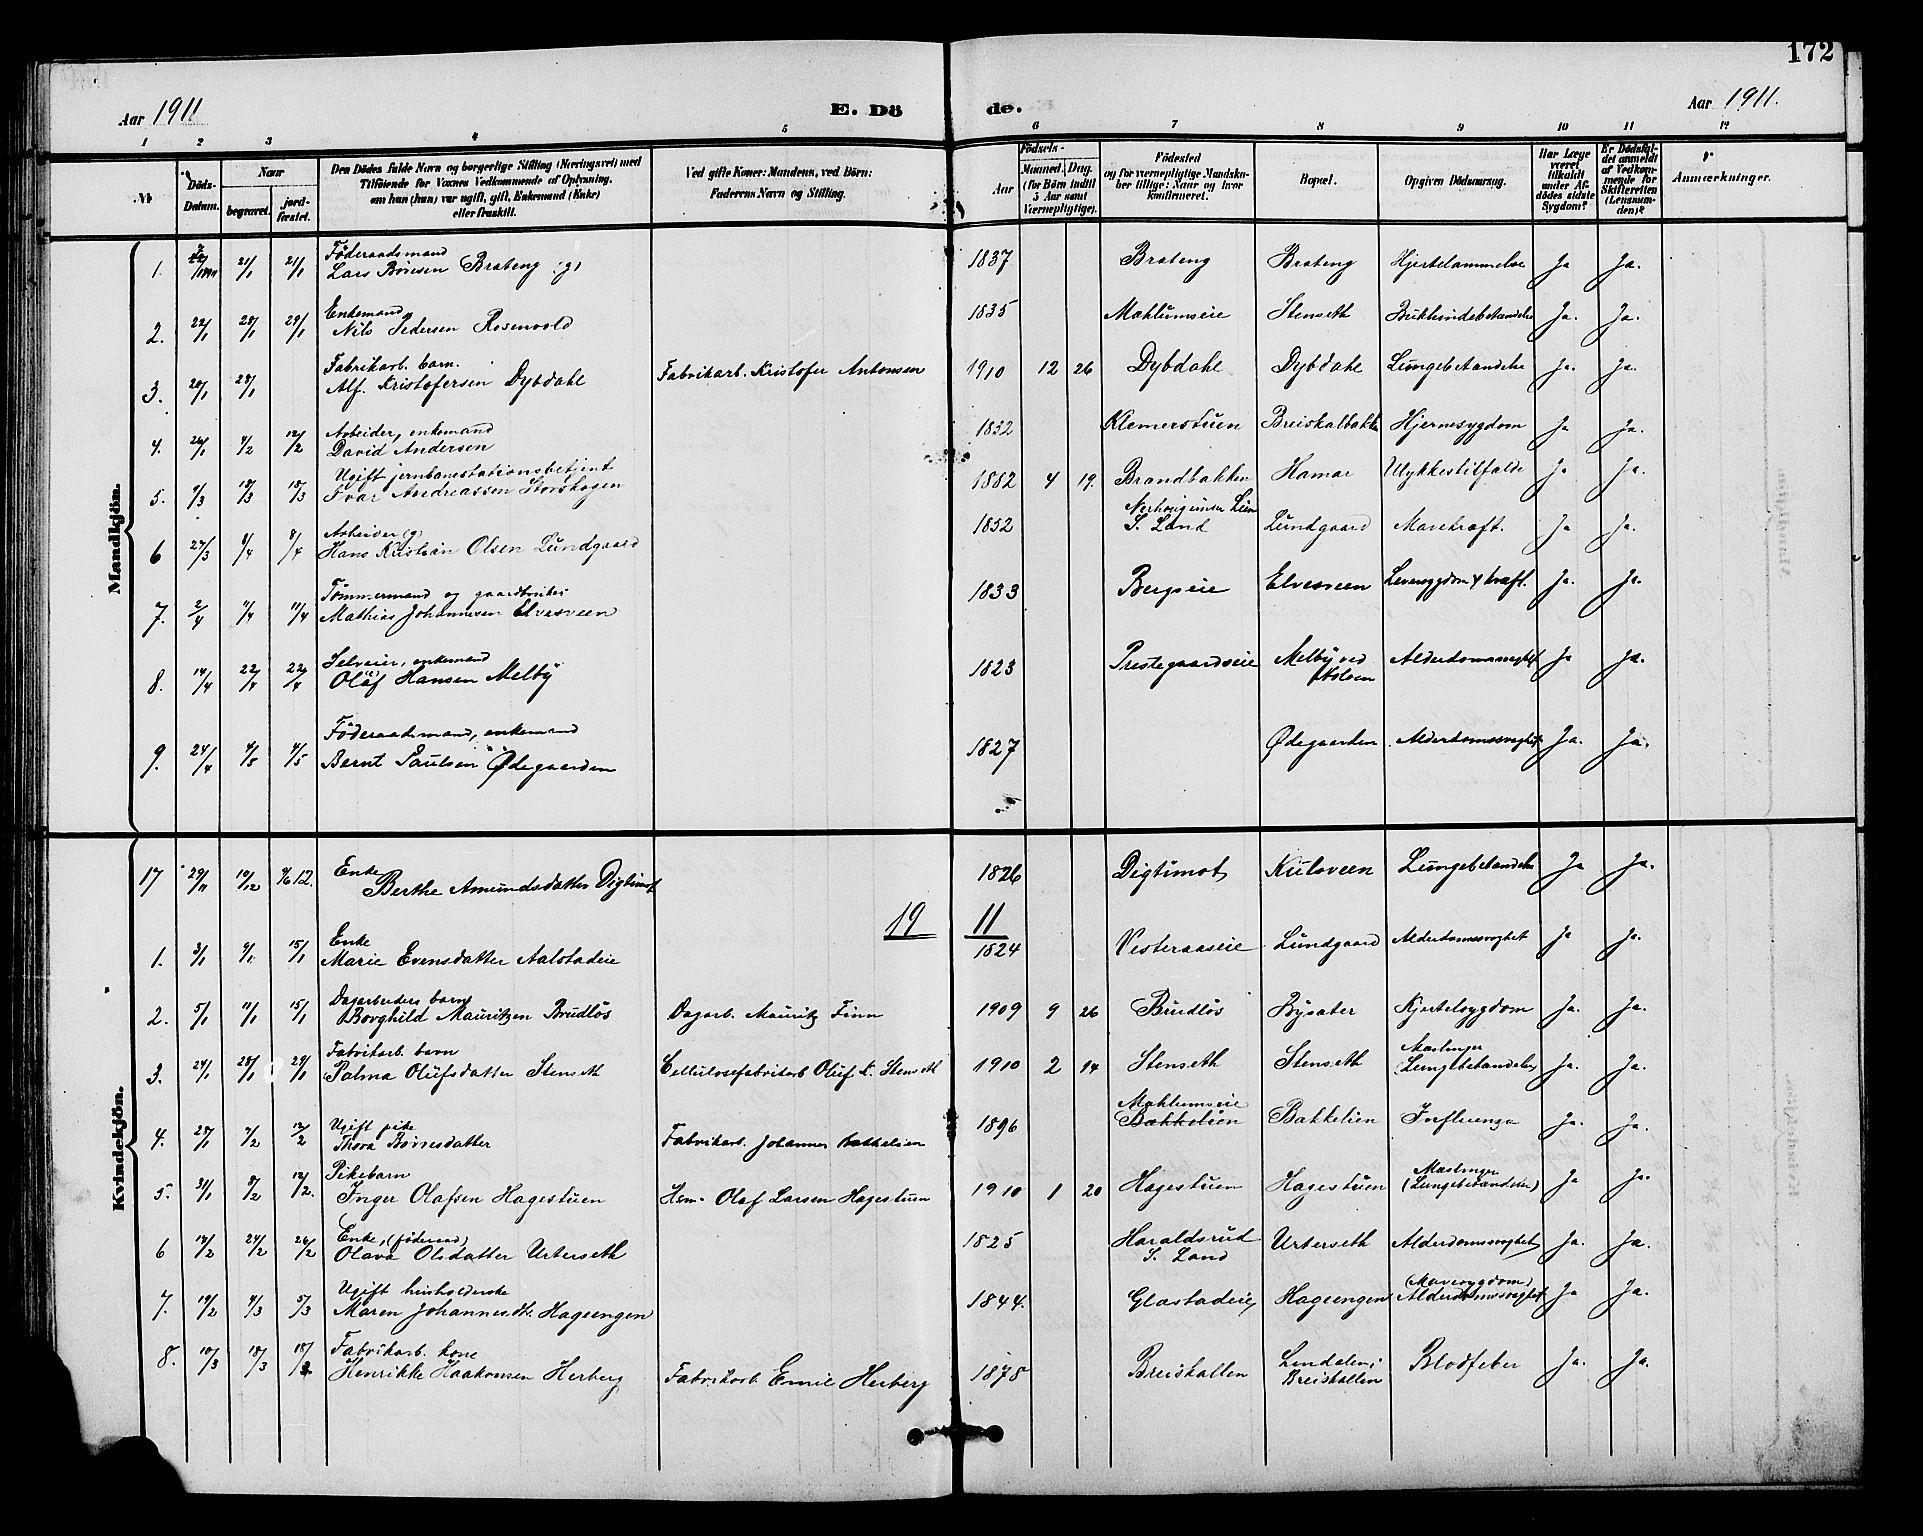 SAH, Vardal prestekontor, H/Ha/Hab/L0011: Klokkerbok nr. 11, 1899-1913, s. 172